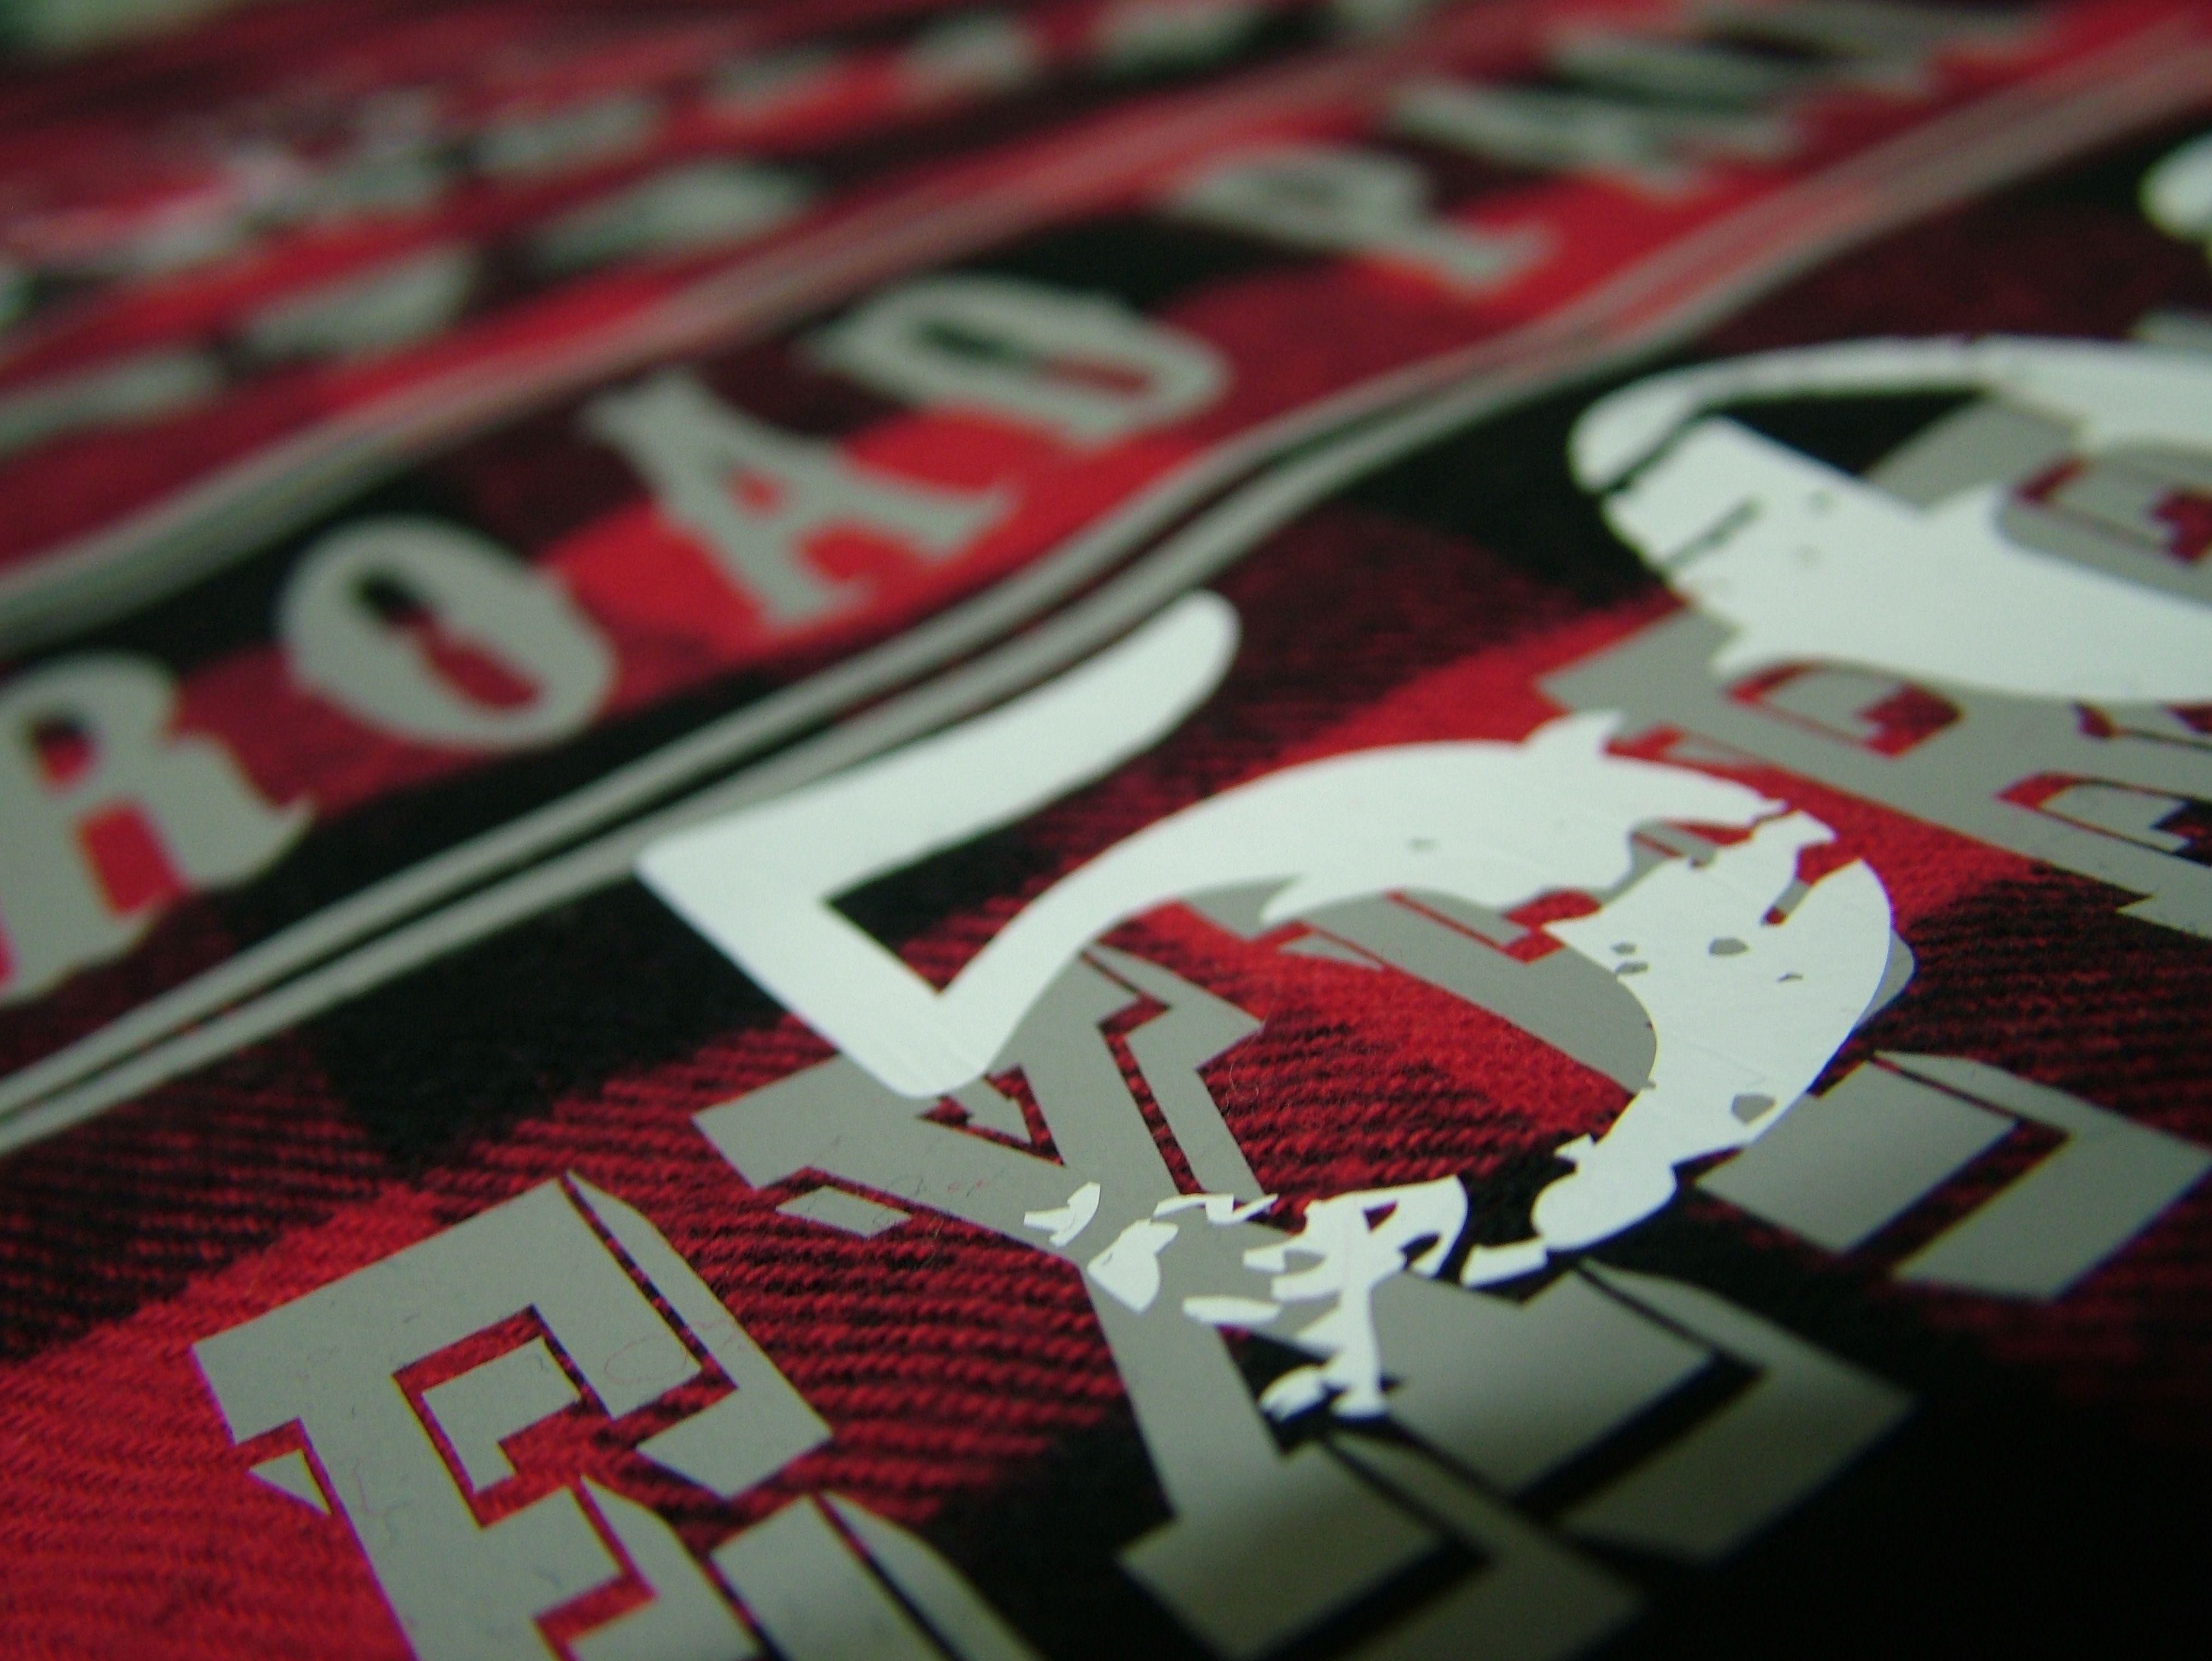 detalle. estampado textil. vinil textil